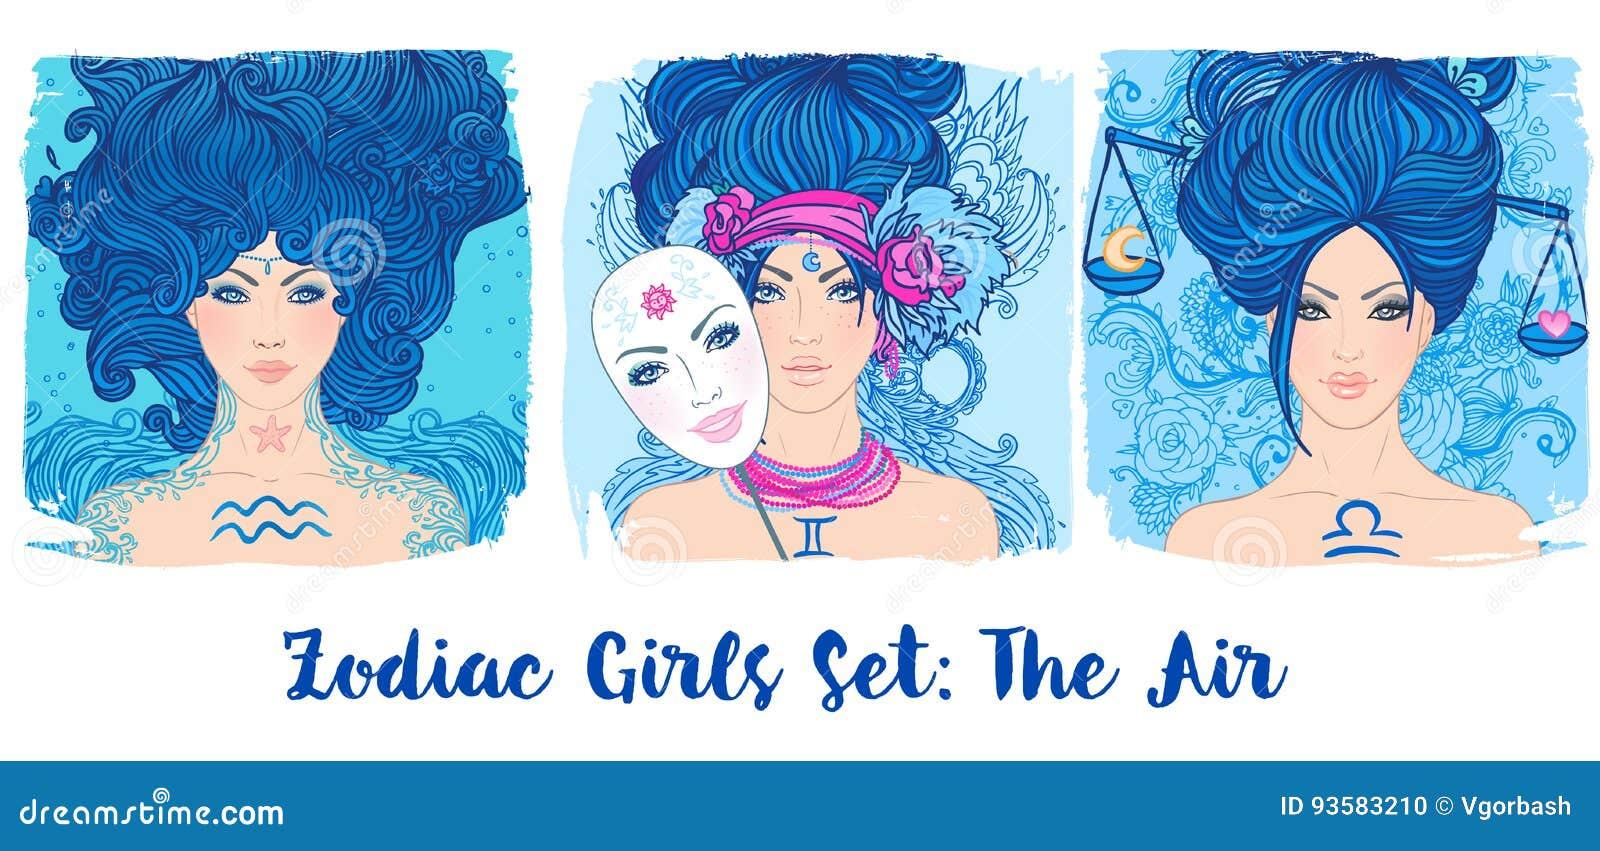 Zodiac Girls Set Air Vector Illustration Of Aquarius Gemini